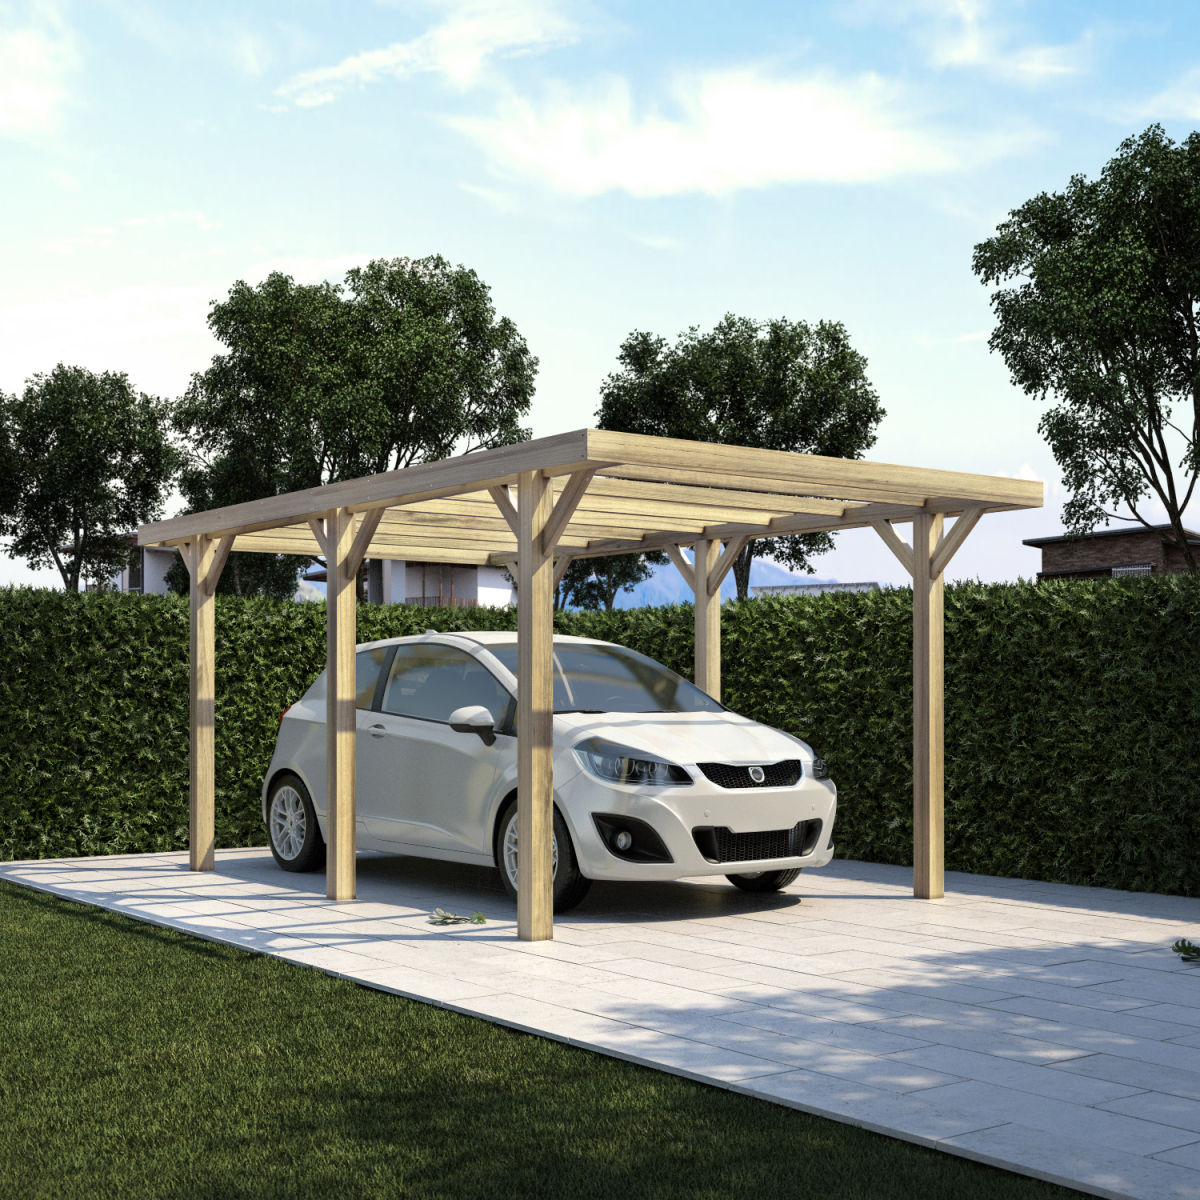 Stunning giardino e firenze x m with coperture mobili per auto for Generatore hyundai leroy merlin